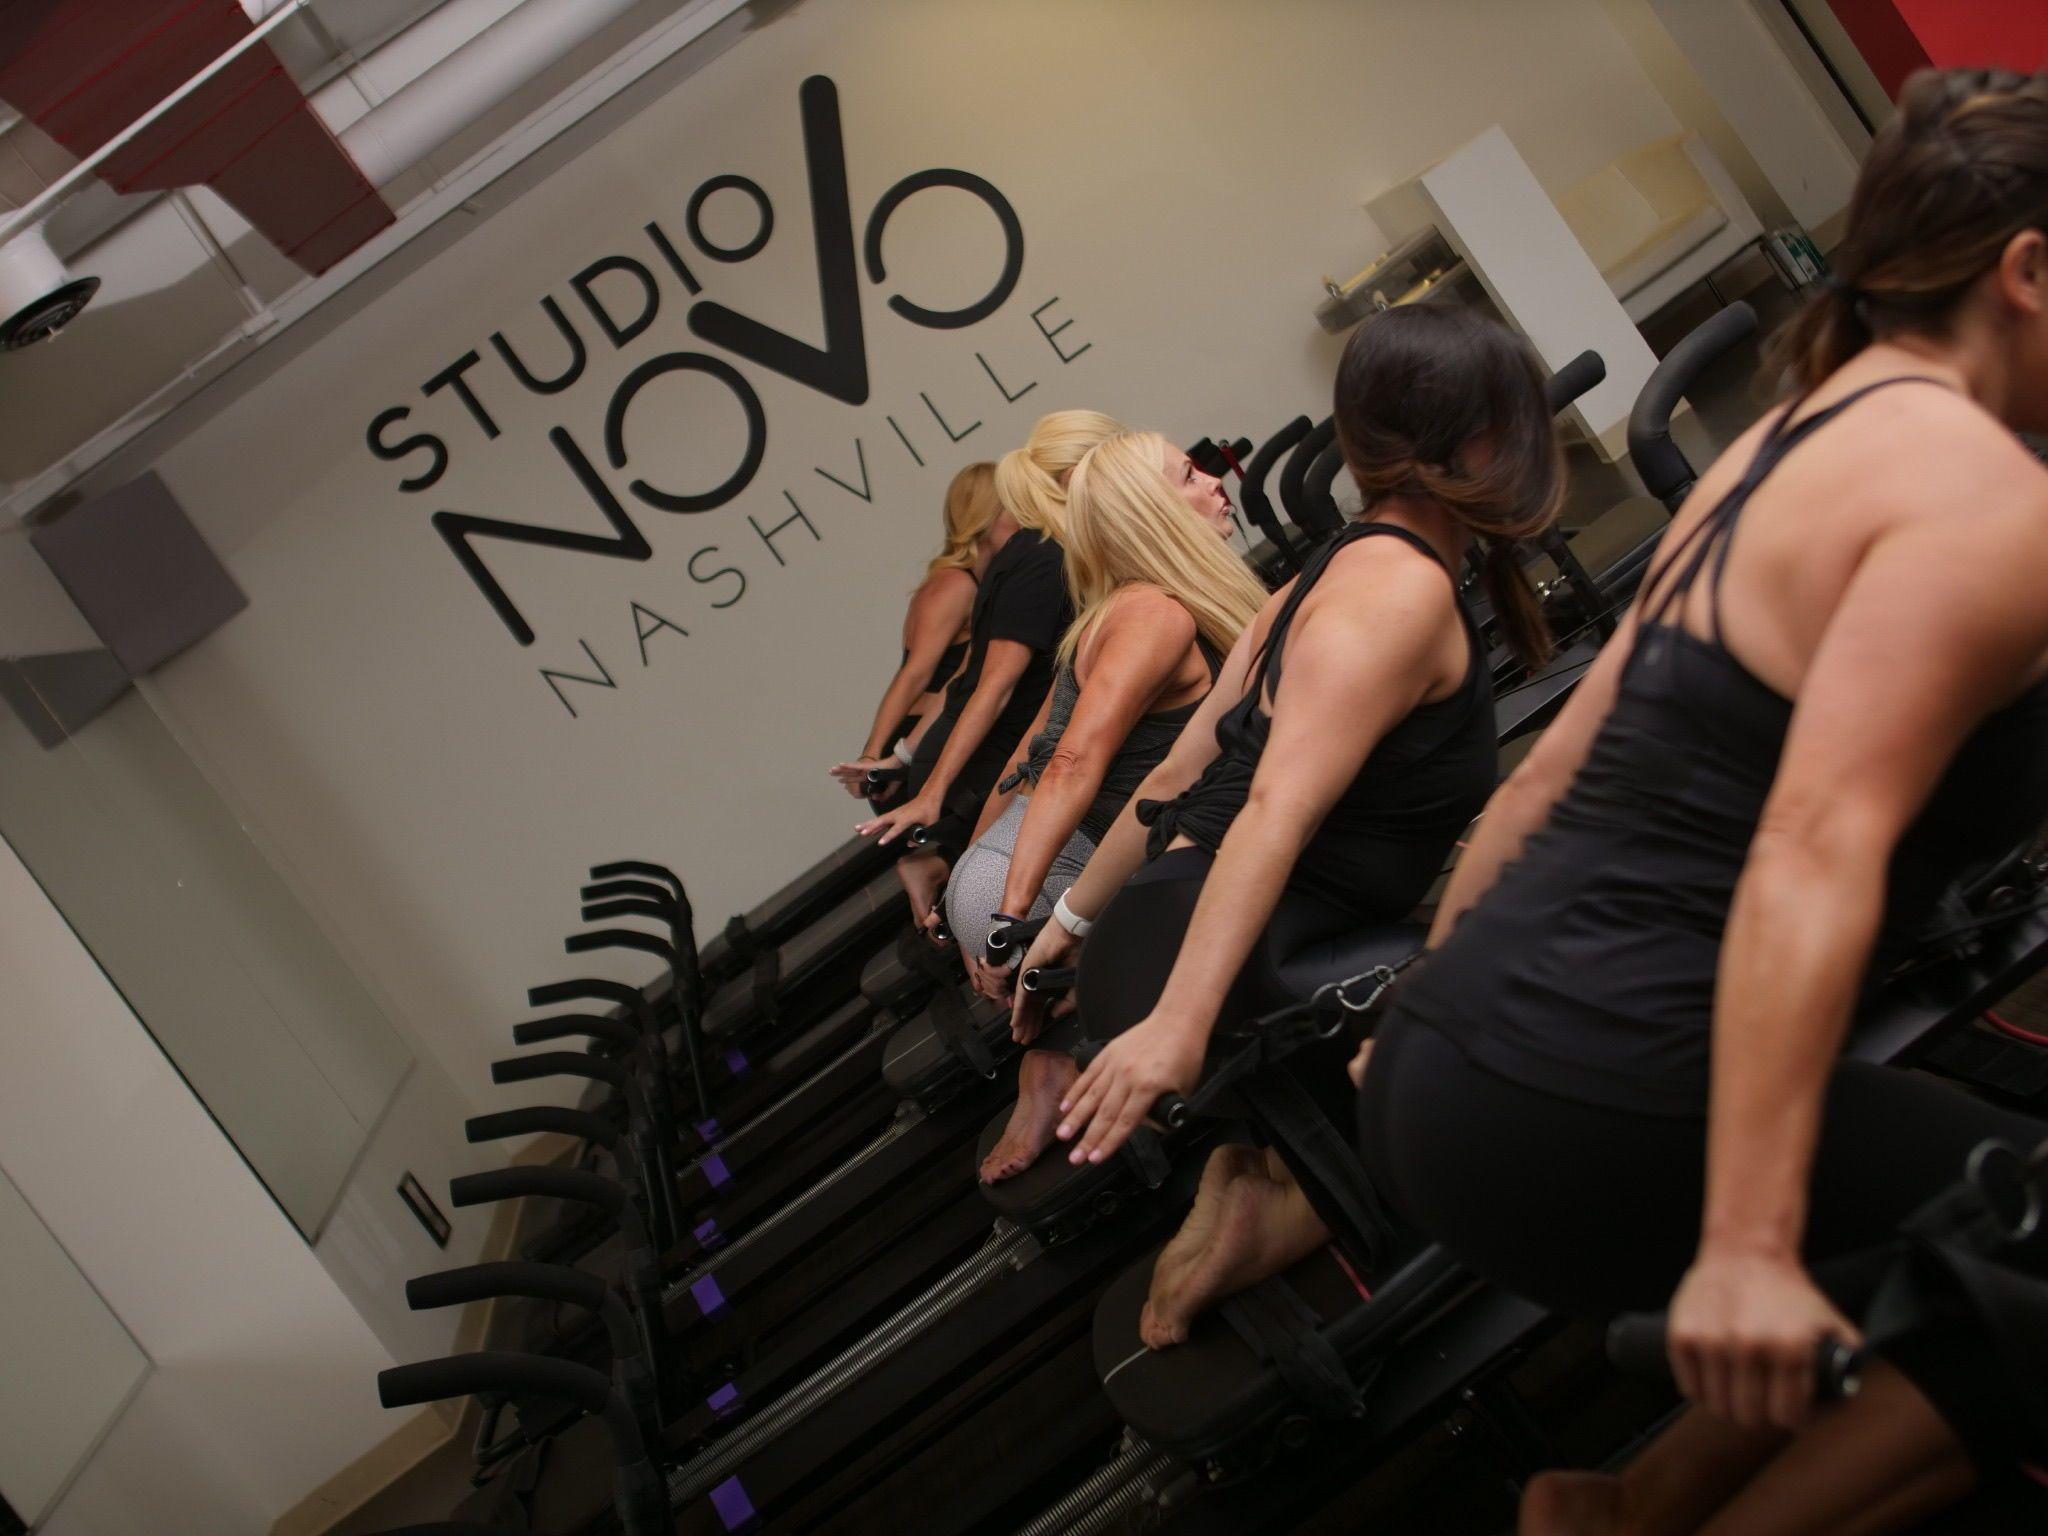 Studio Novo The Pink Bride Lagree fitness, Circuit